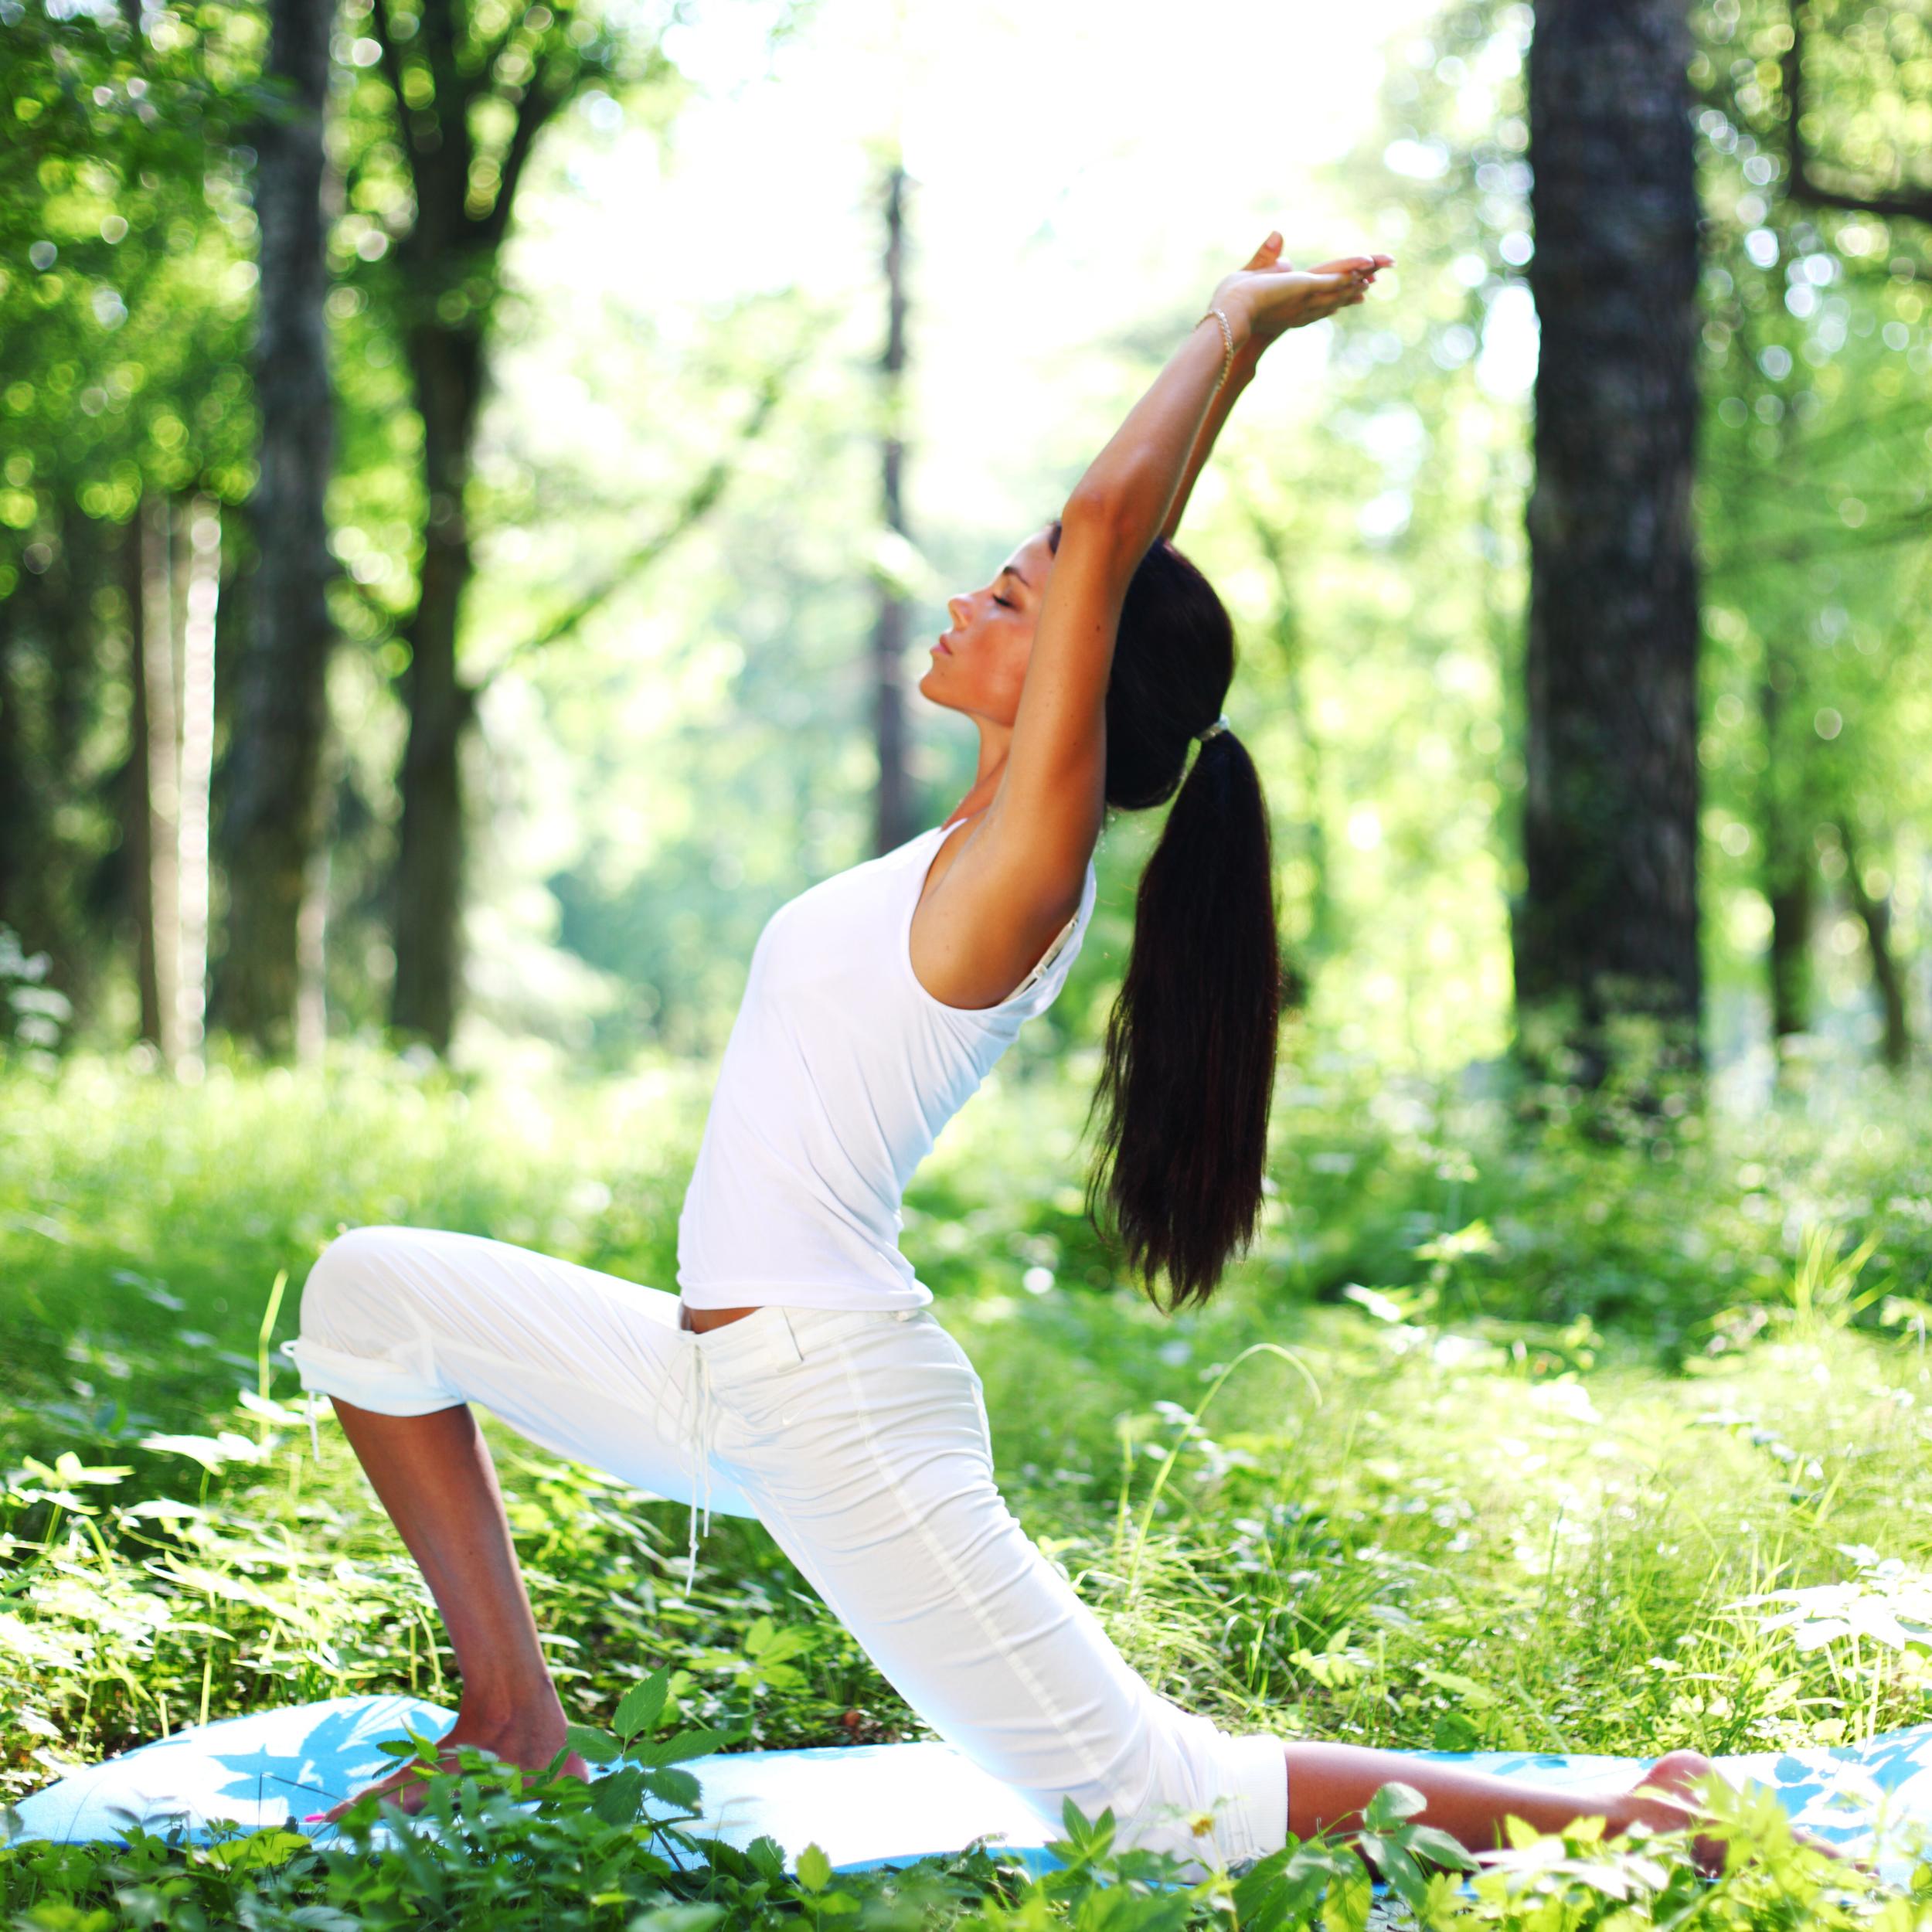 bigstock-yoga-woman-on-green-park-12509636.jpg